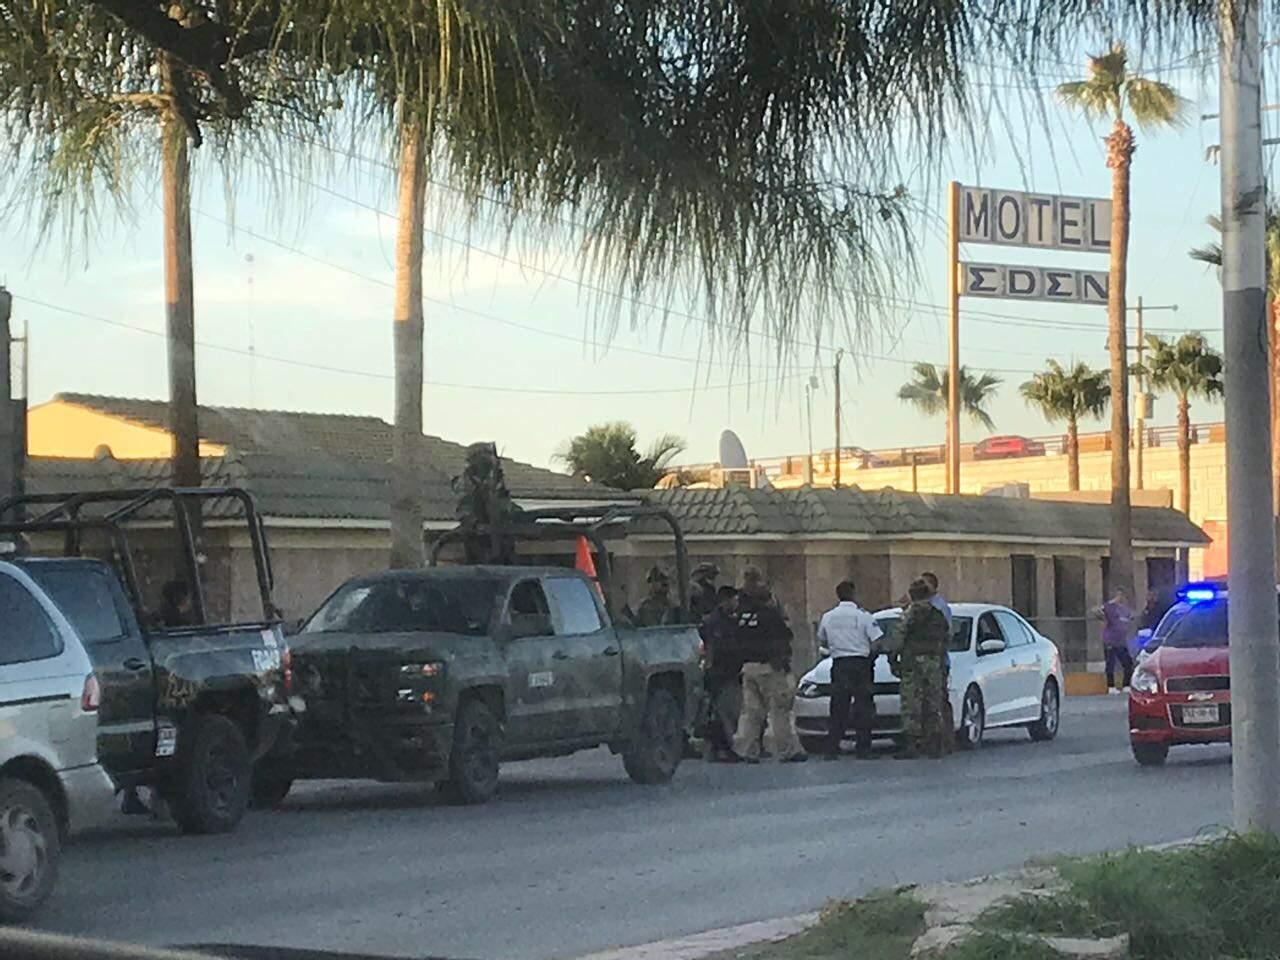 Presunto guardaespaldas encañona a agente vial en Torreón